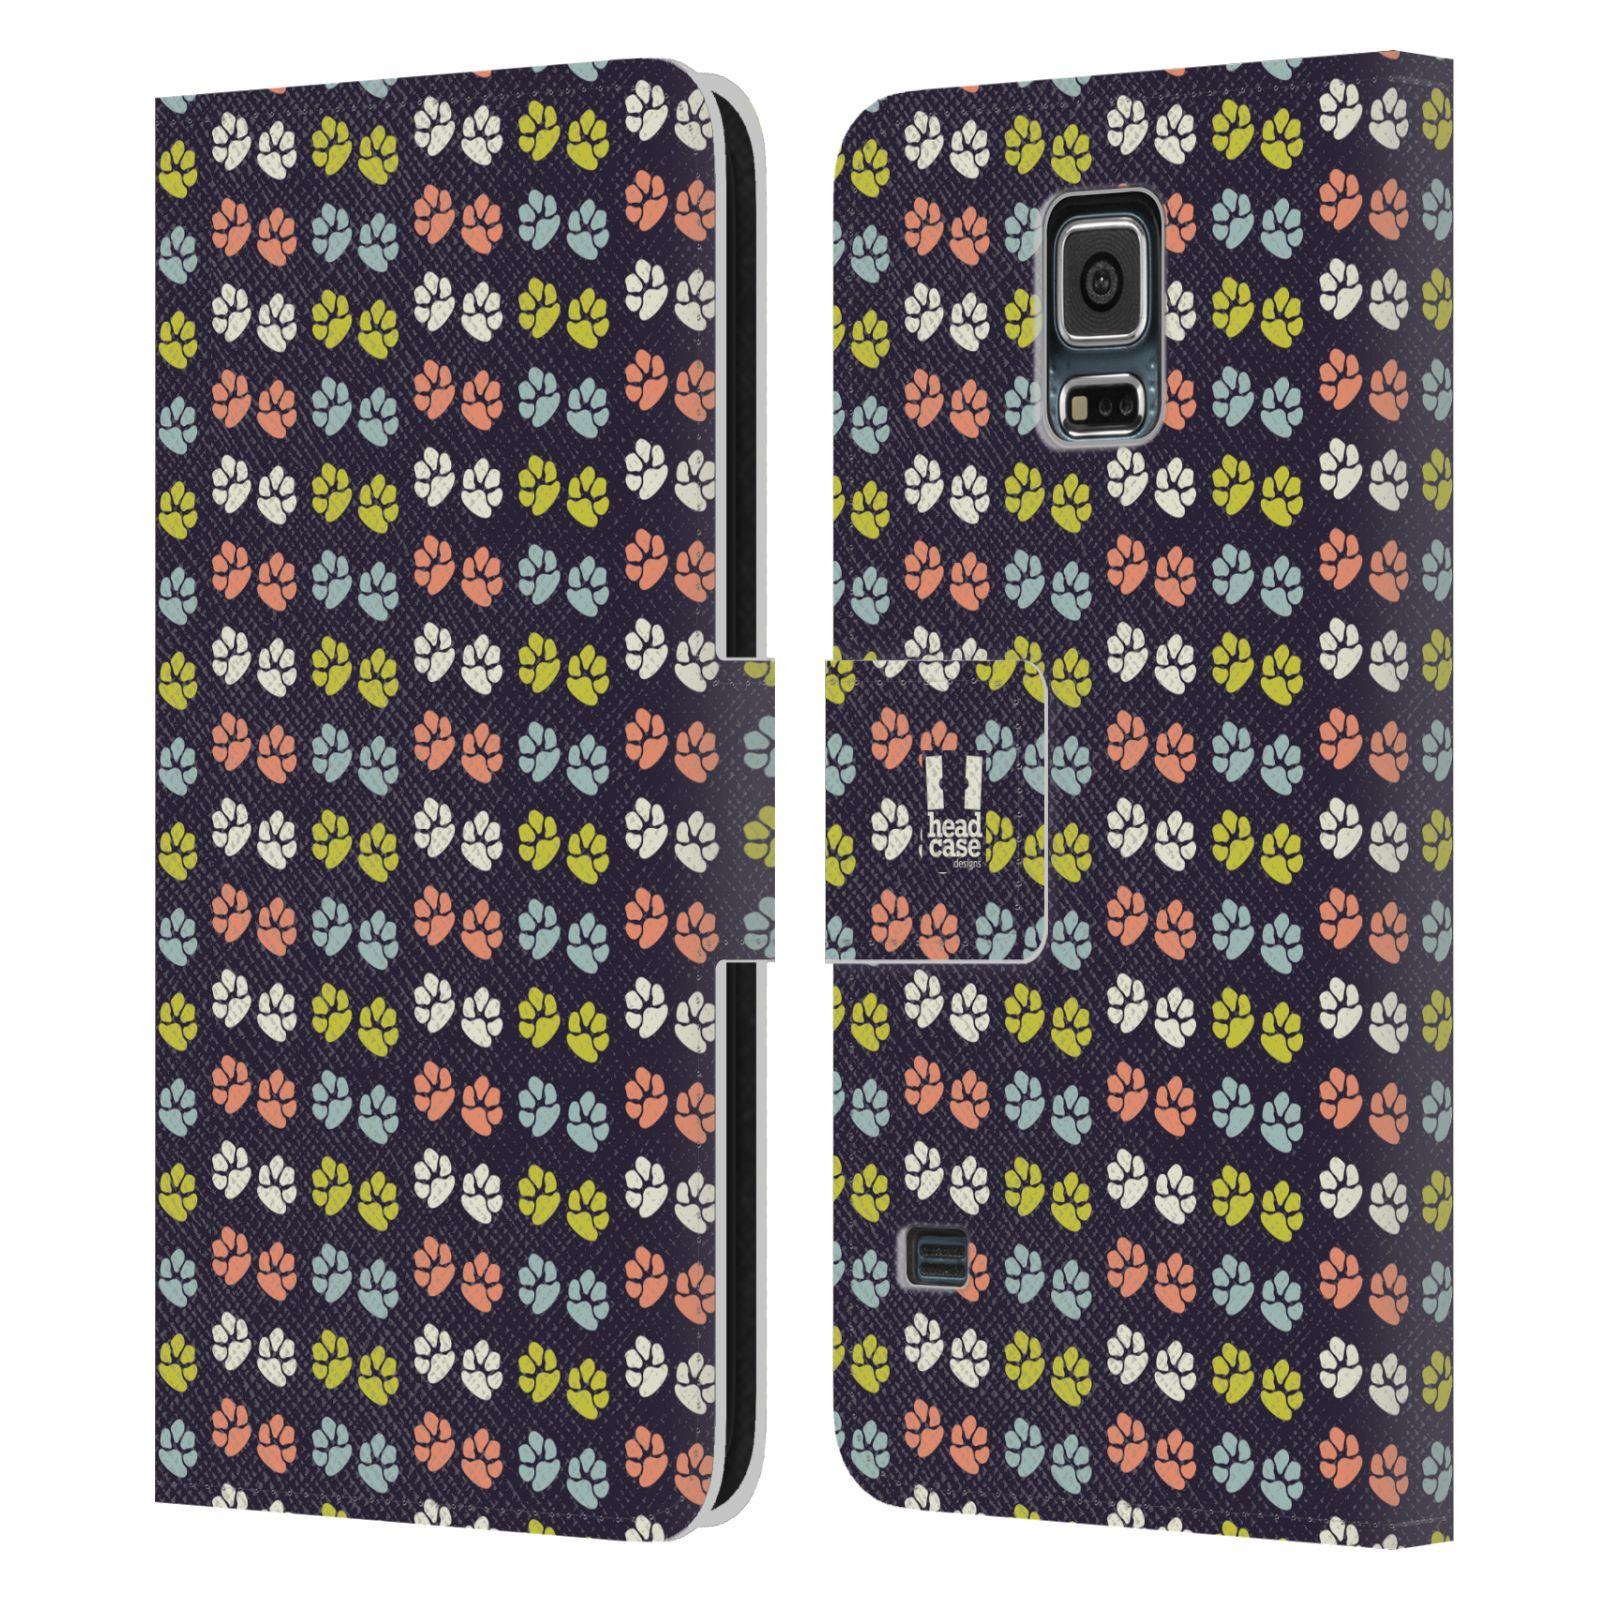 HEAD CASE Flipové pouzdro pro mobil Samsung Galaxy S5 / S5 NEO Pejsek ťapky barevné RETRO